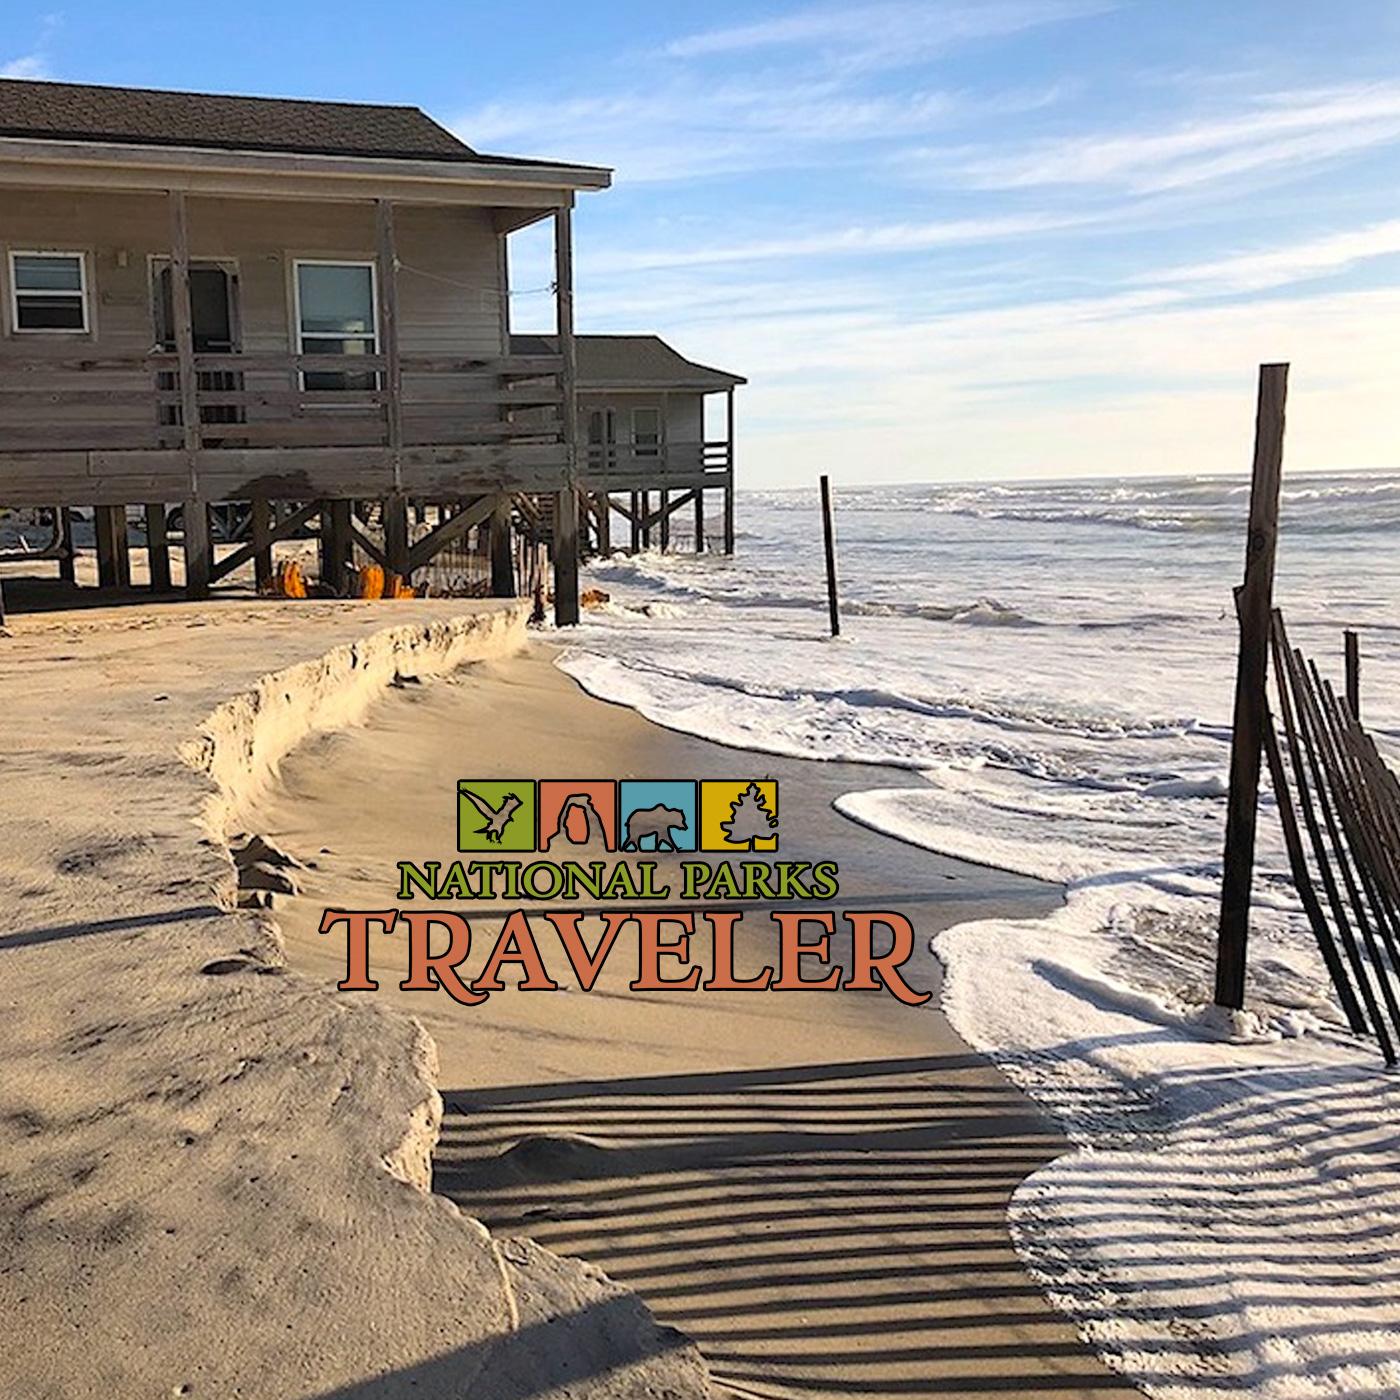 Artwork for National Parks Traveler: Sea Level Rise And National Parks, Great Sea Kayaking Park Destinations